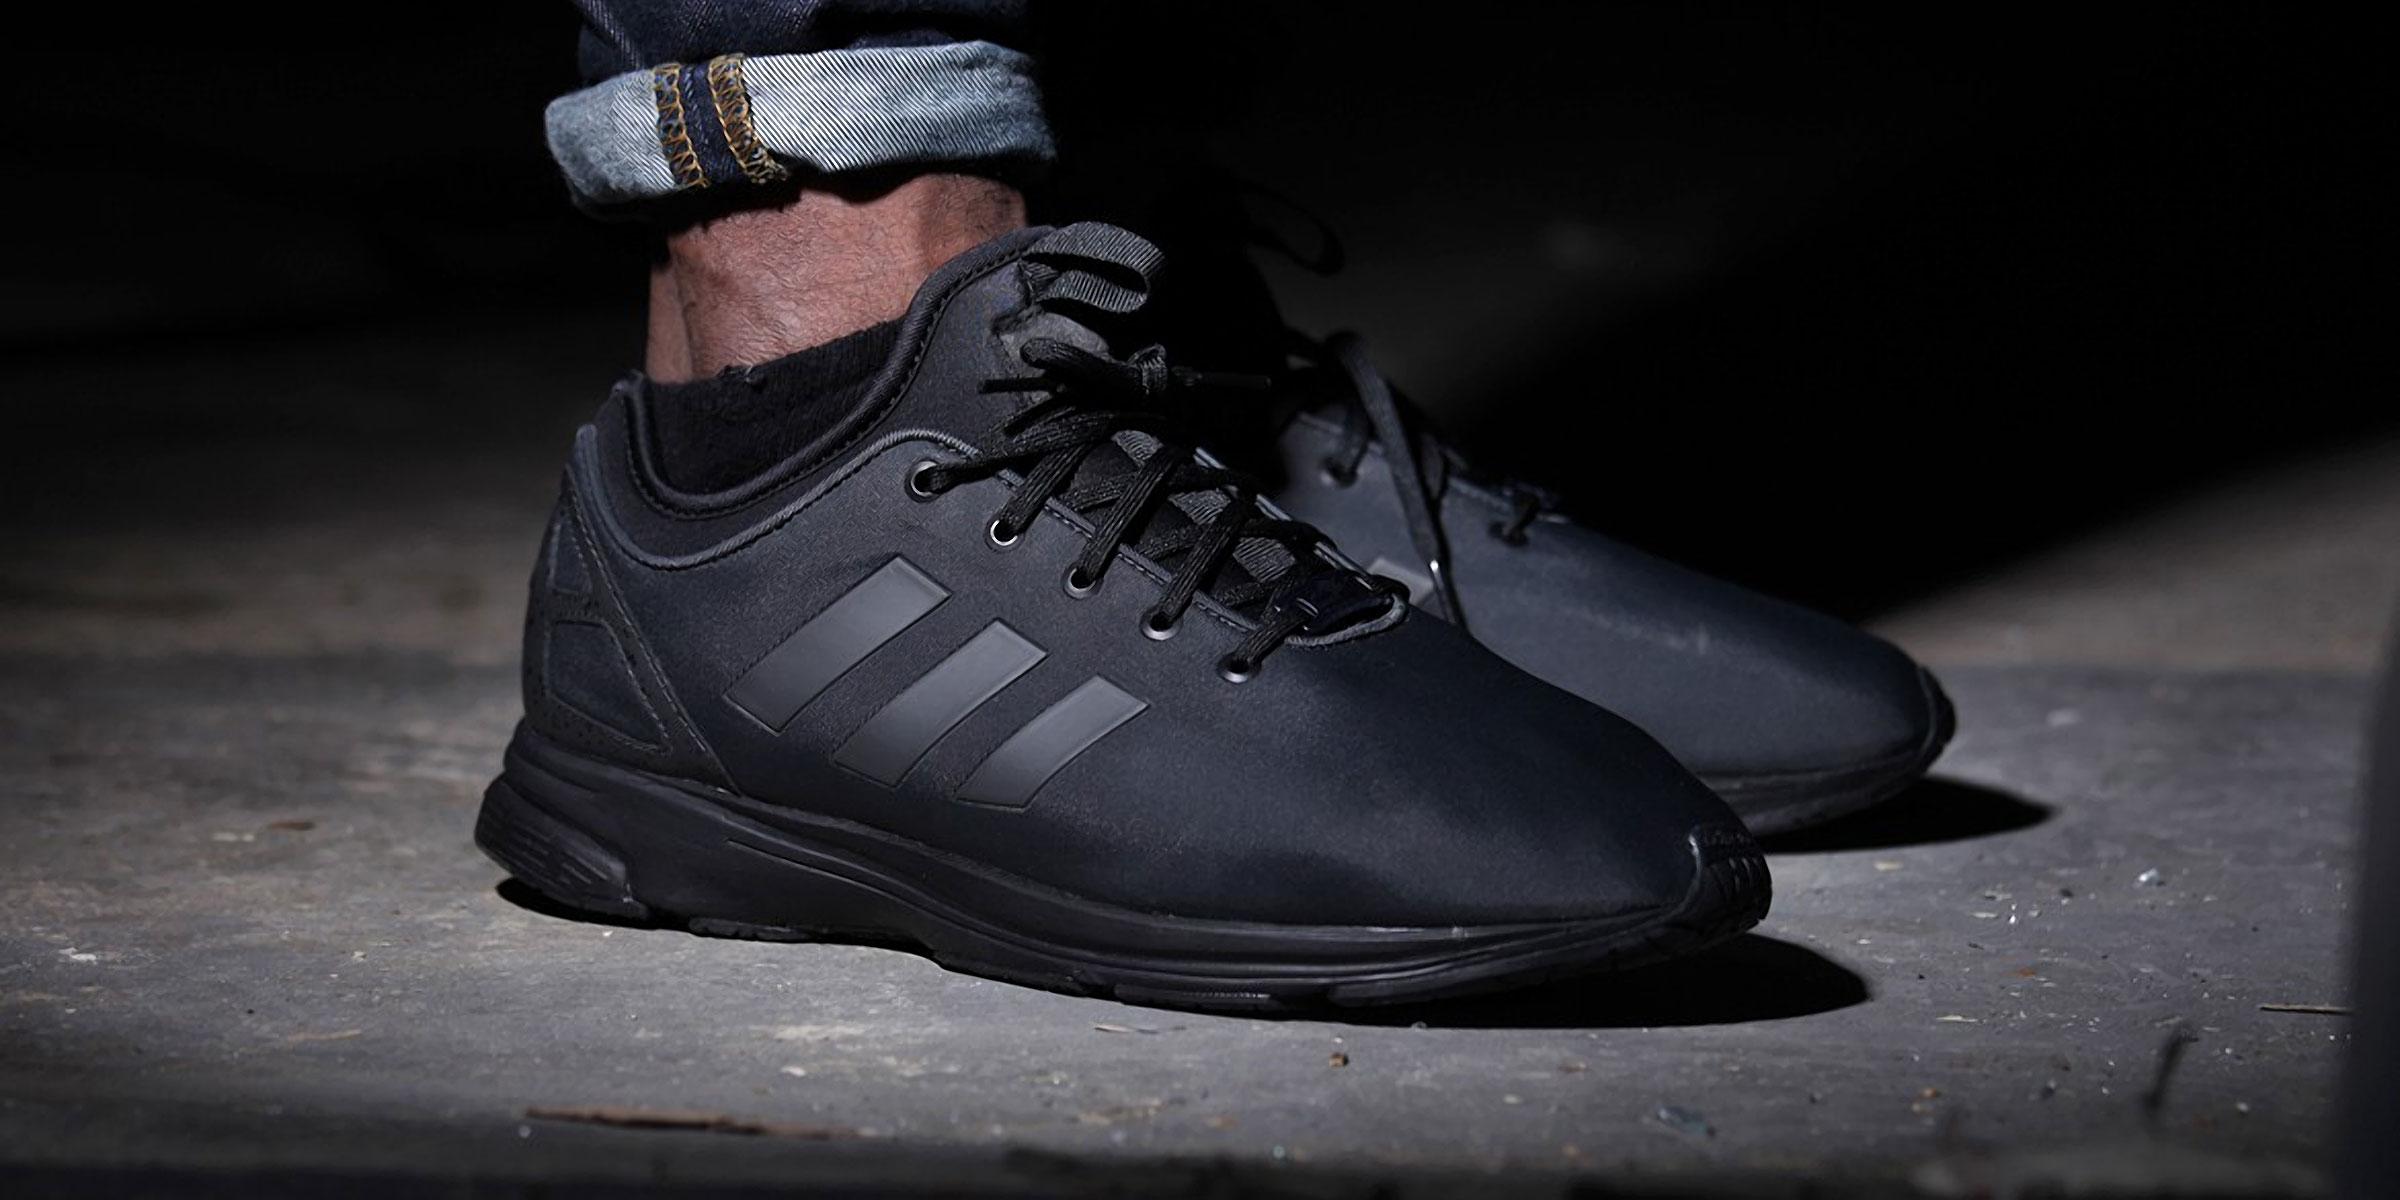 ADIDAS ORIGINALS ZX FLUX (BUTTERFLY) | Sneaker Freaker